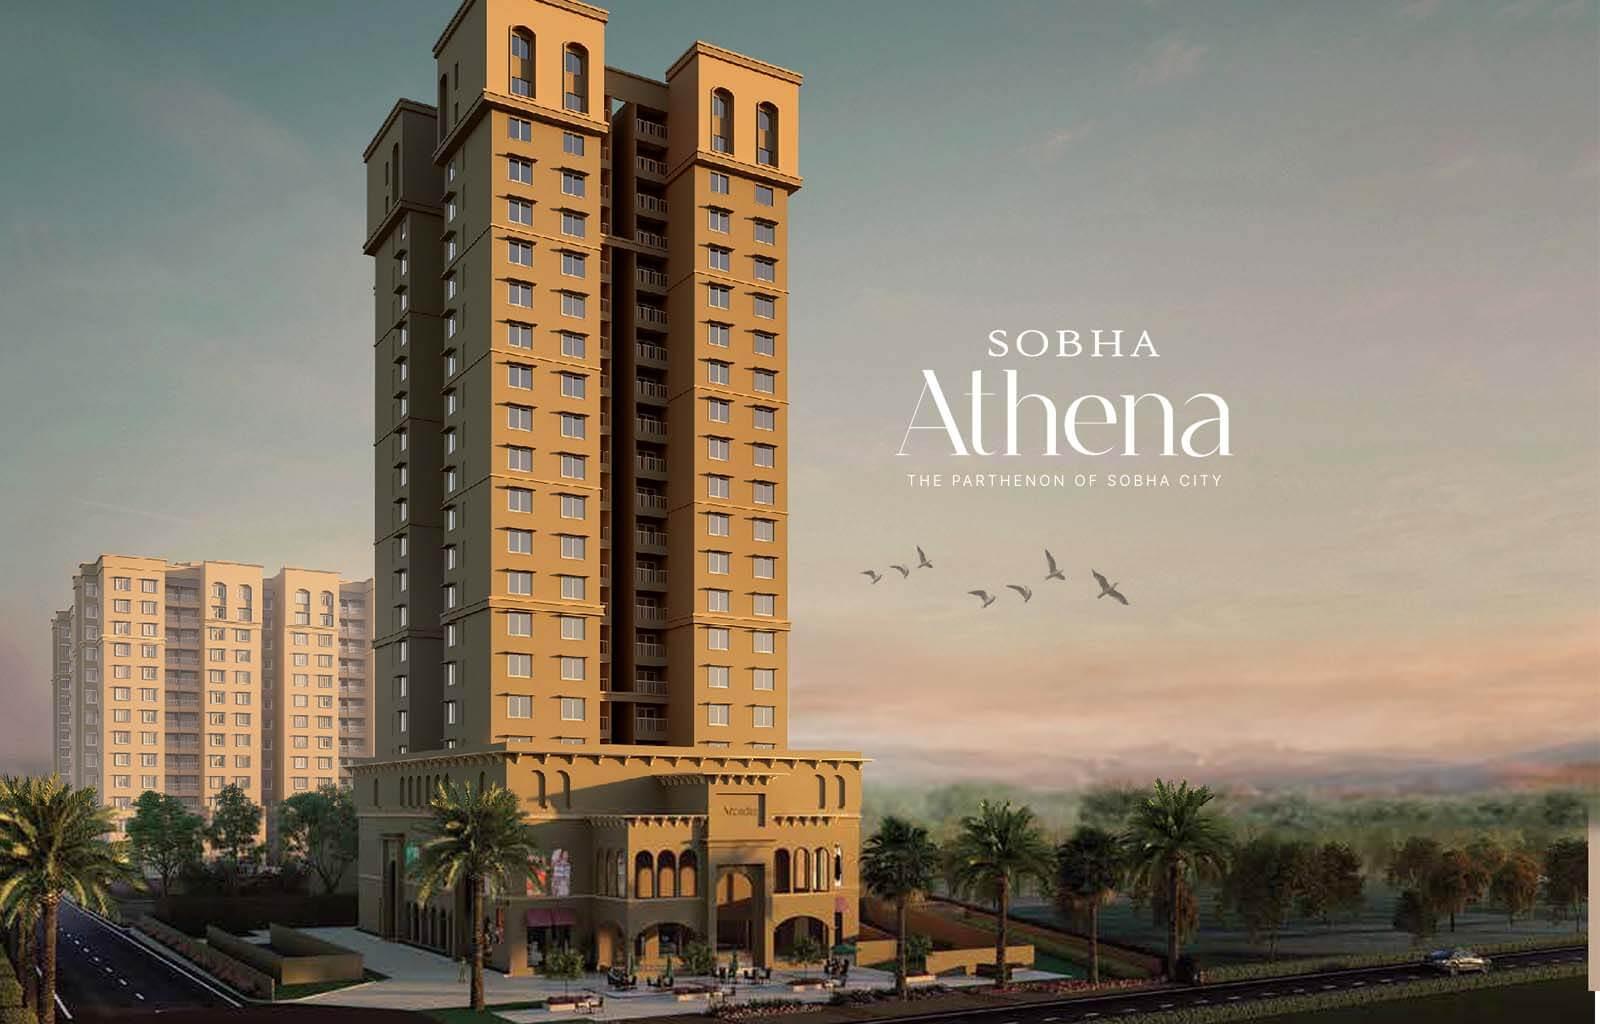 Sobha Athena